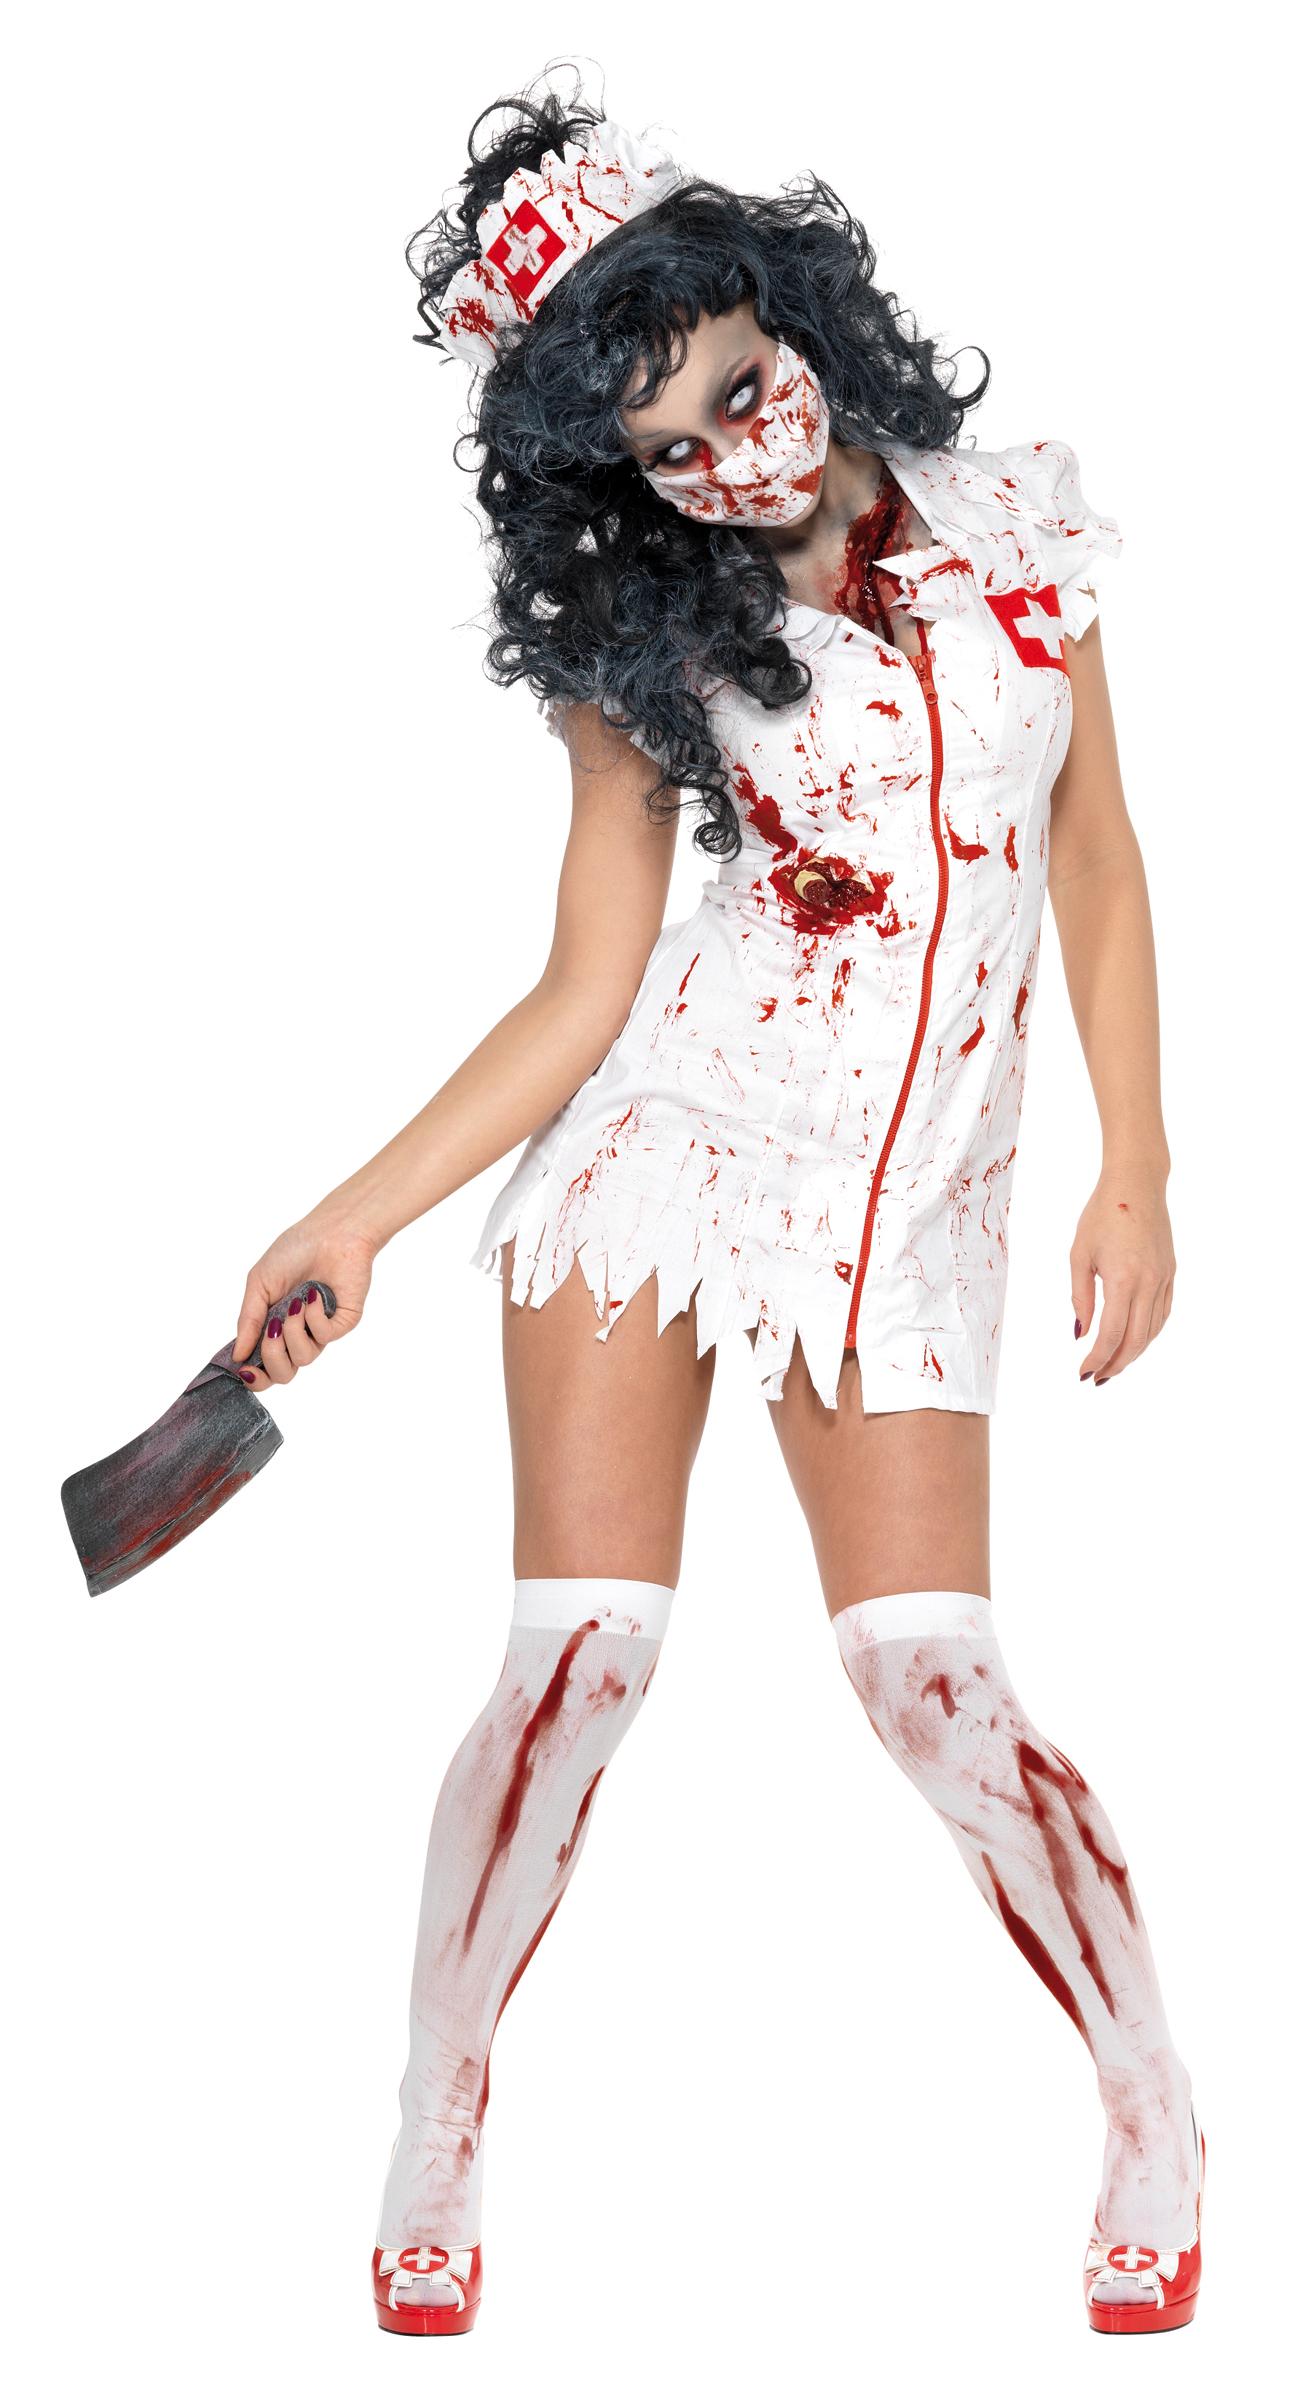 d guisement infirmi re halloween robe infirmi re zombie. Black Bedroom Furniture Sets. Home Design Ideas